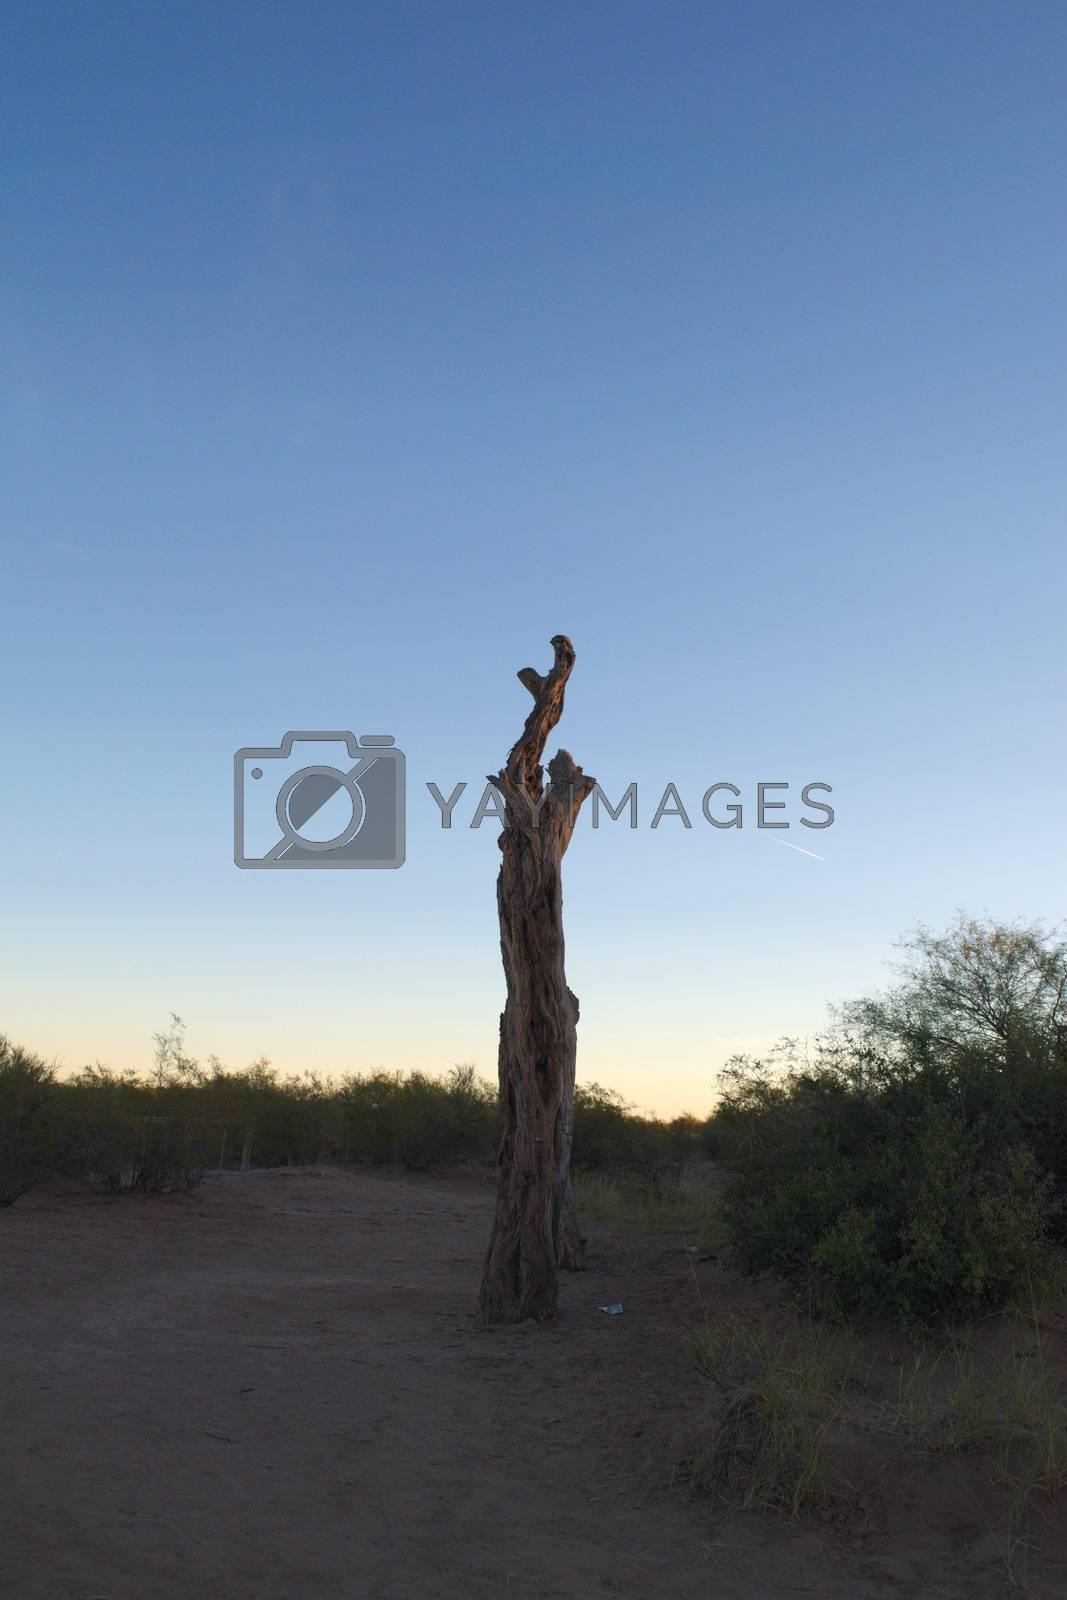 Royalty free image of Dead tree at dusk in the desert by hernan_hyper